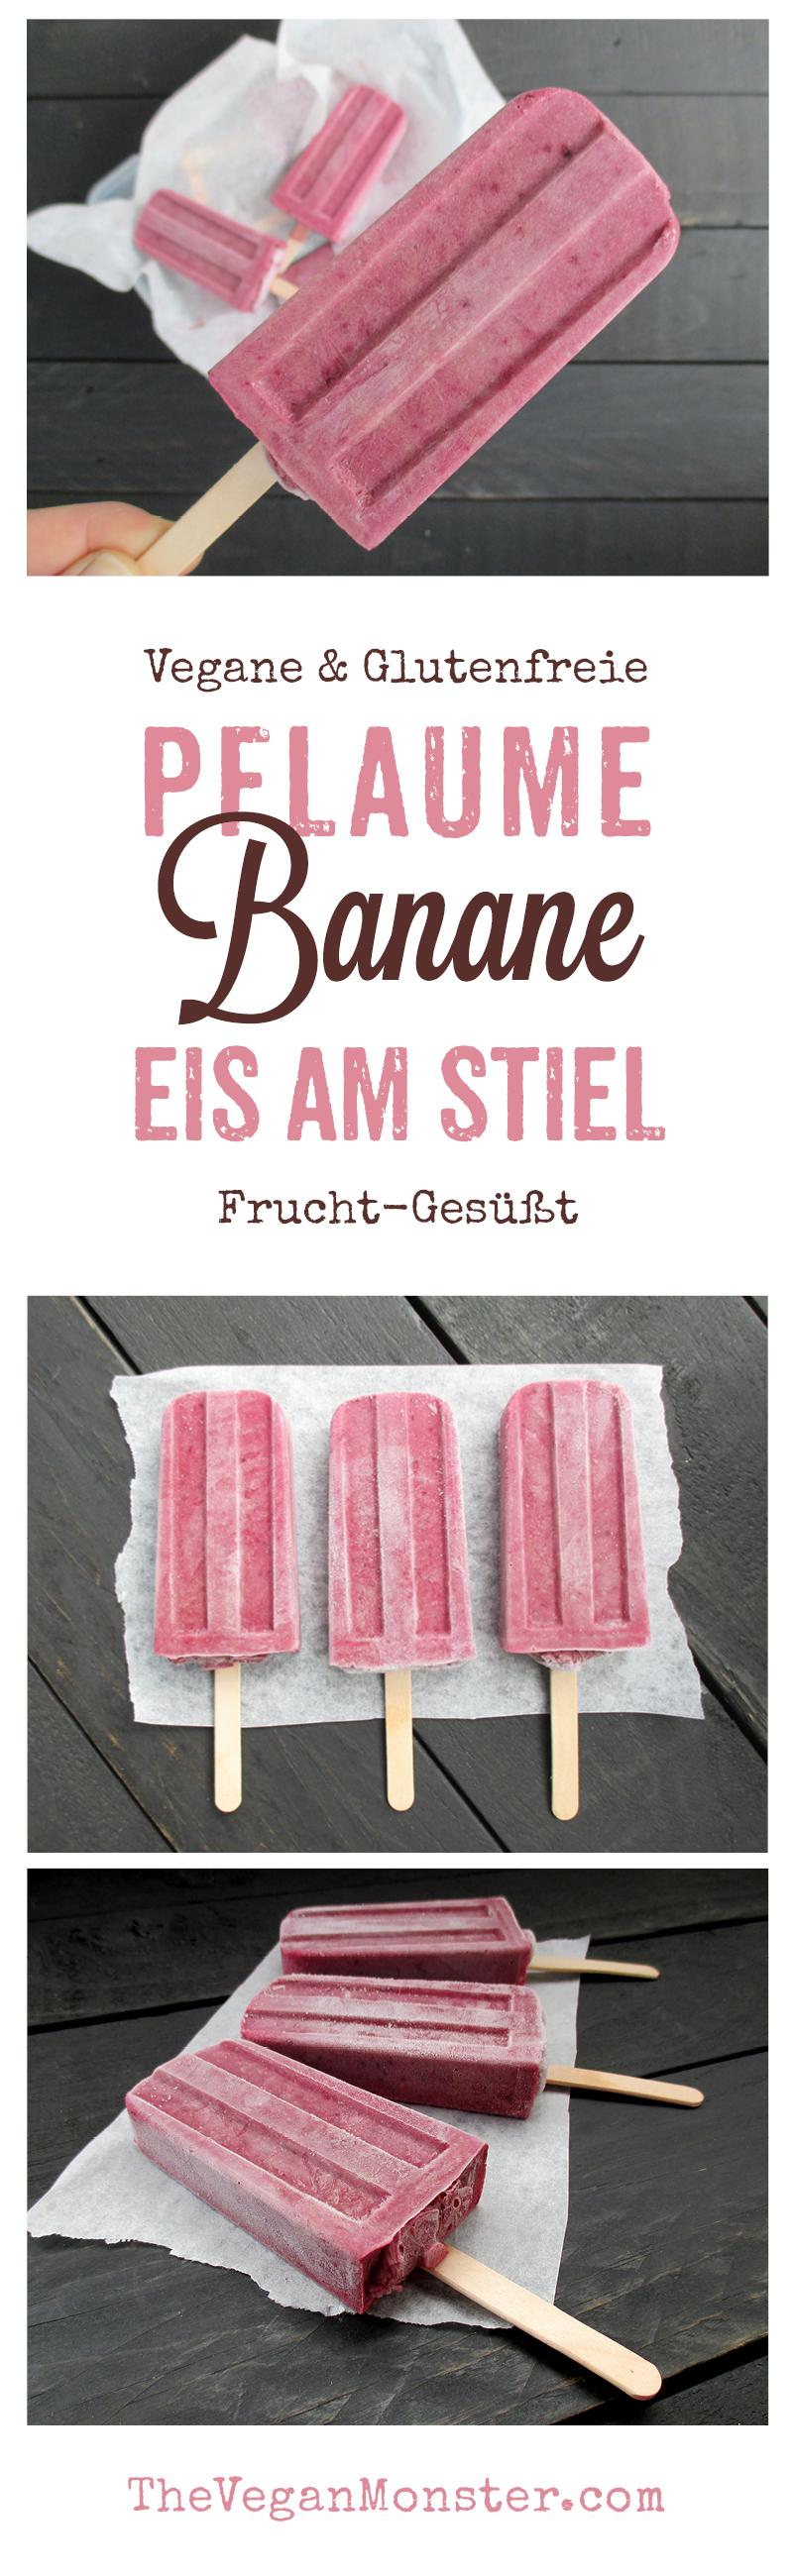 Vegane Glutenfreie Pflaumen Bananen Eis Am Stiel Ohne Kristallzucker Rezept